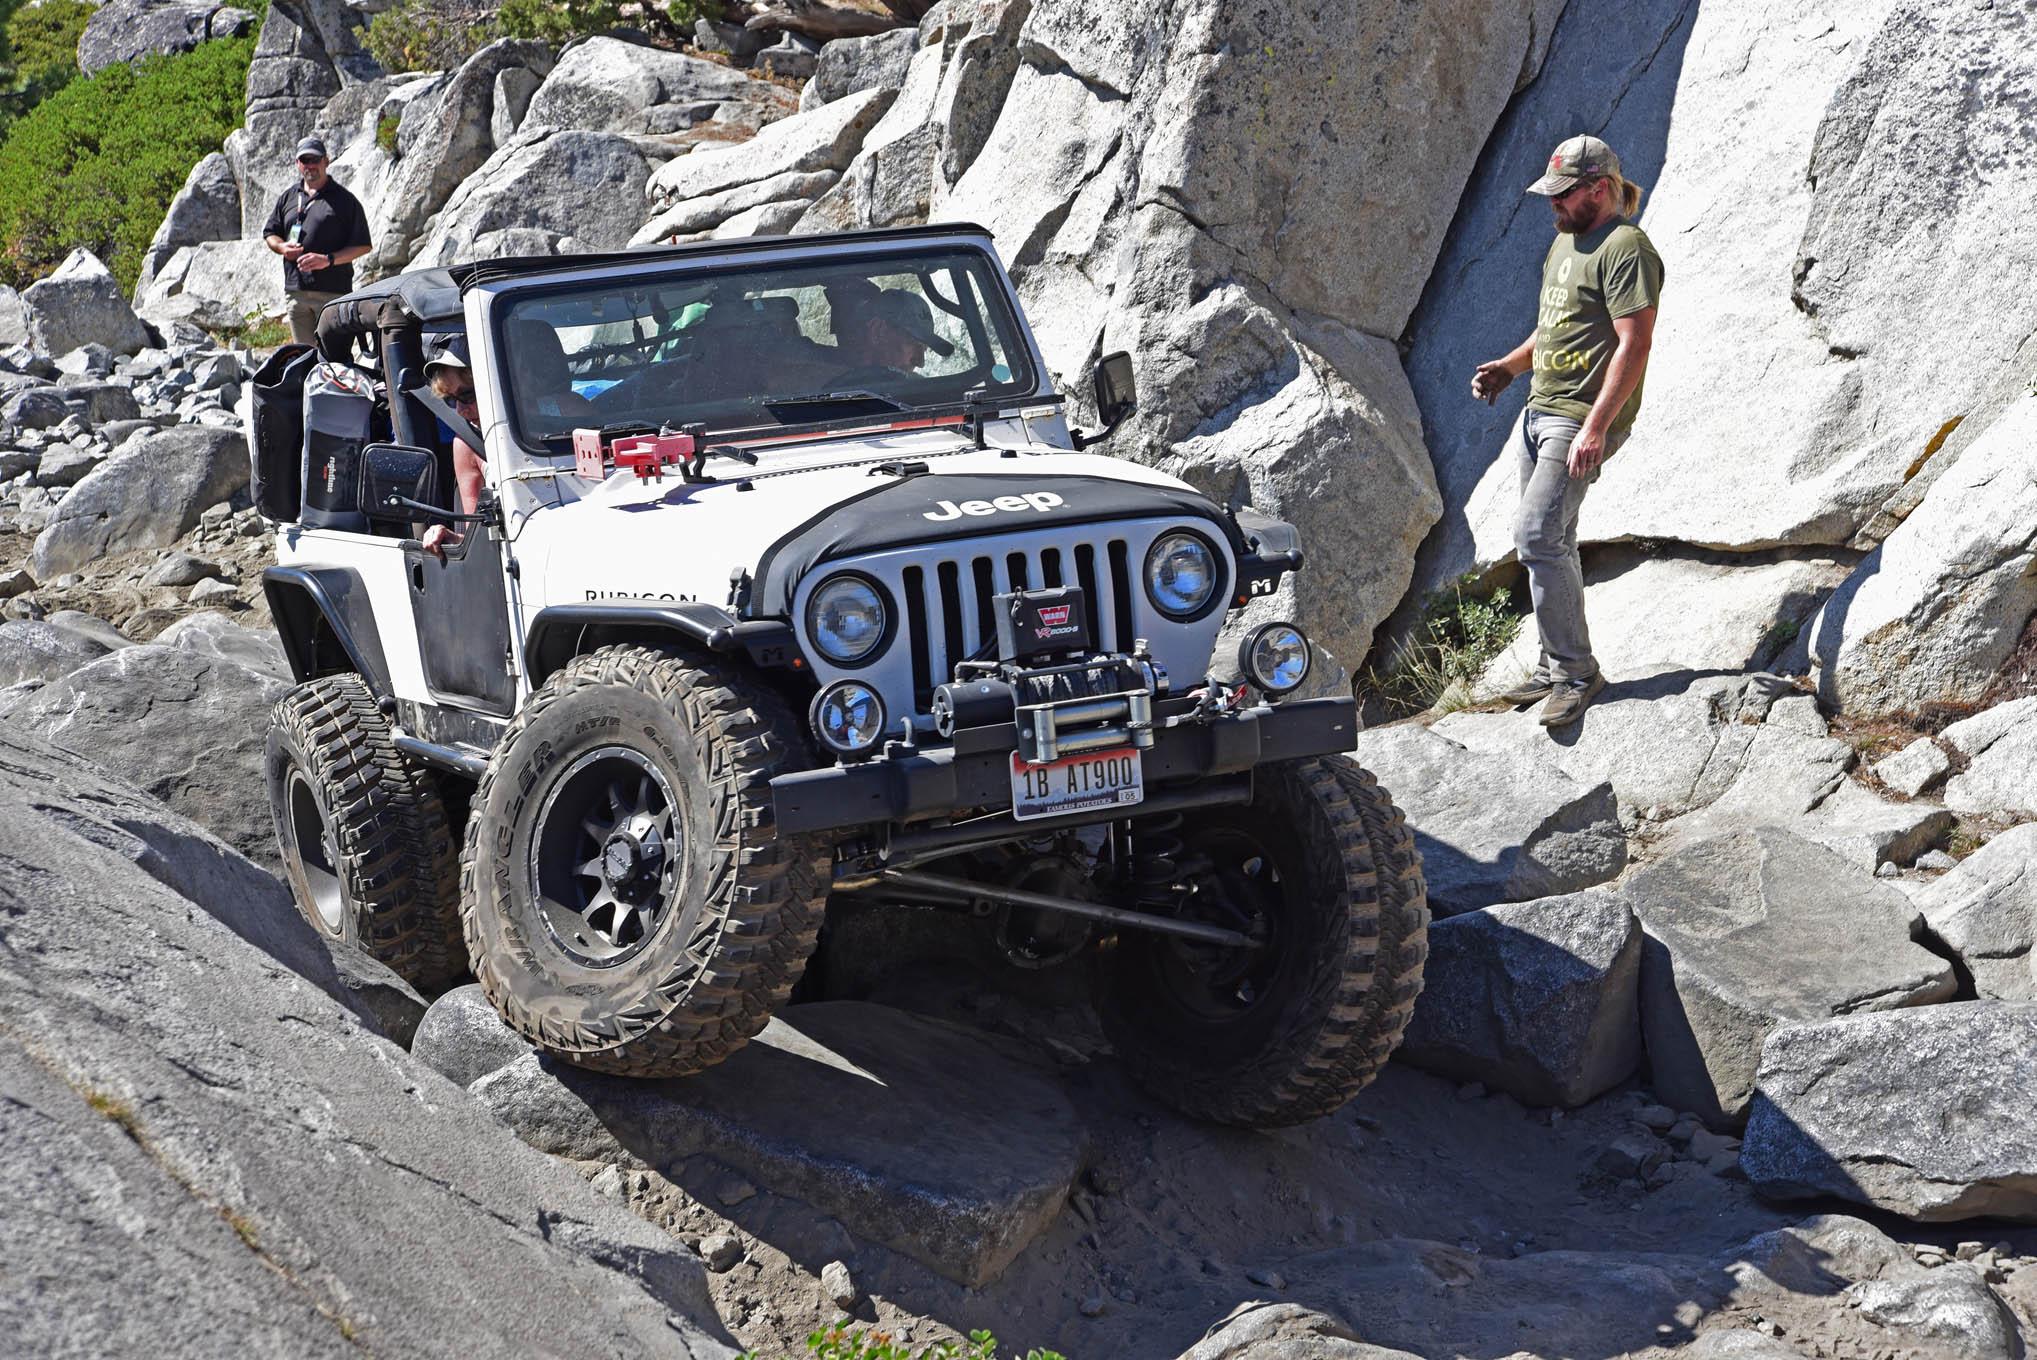 048 rubicon trail modern jeeper adventures metal cloak 2019 stuart bourdon